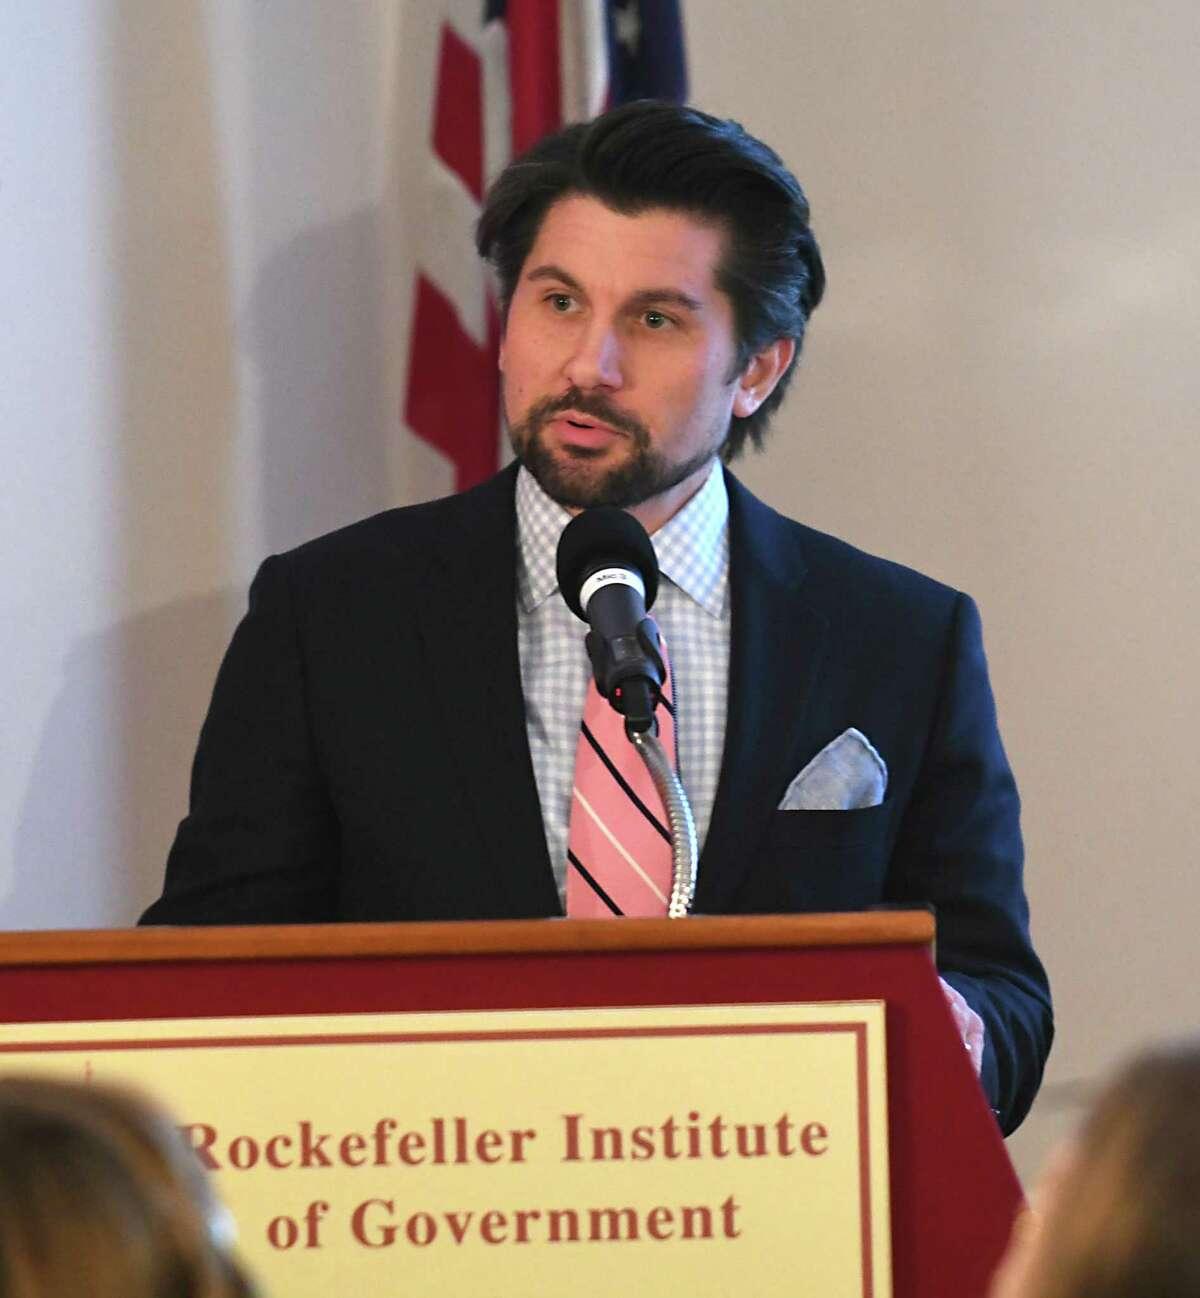 Jim Malatras, president of the Rockefeller Institute. Lori Van Buren / Times Union)